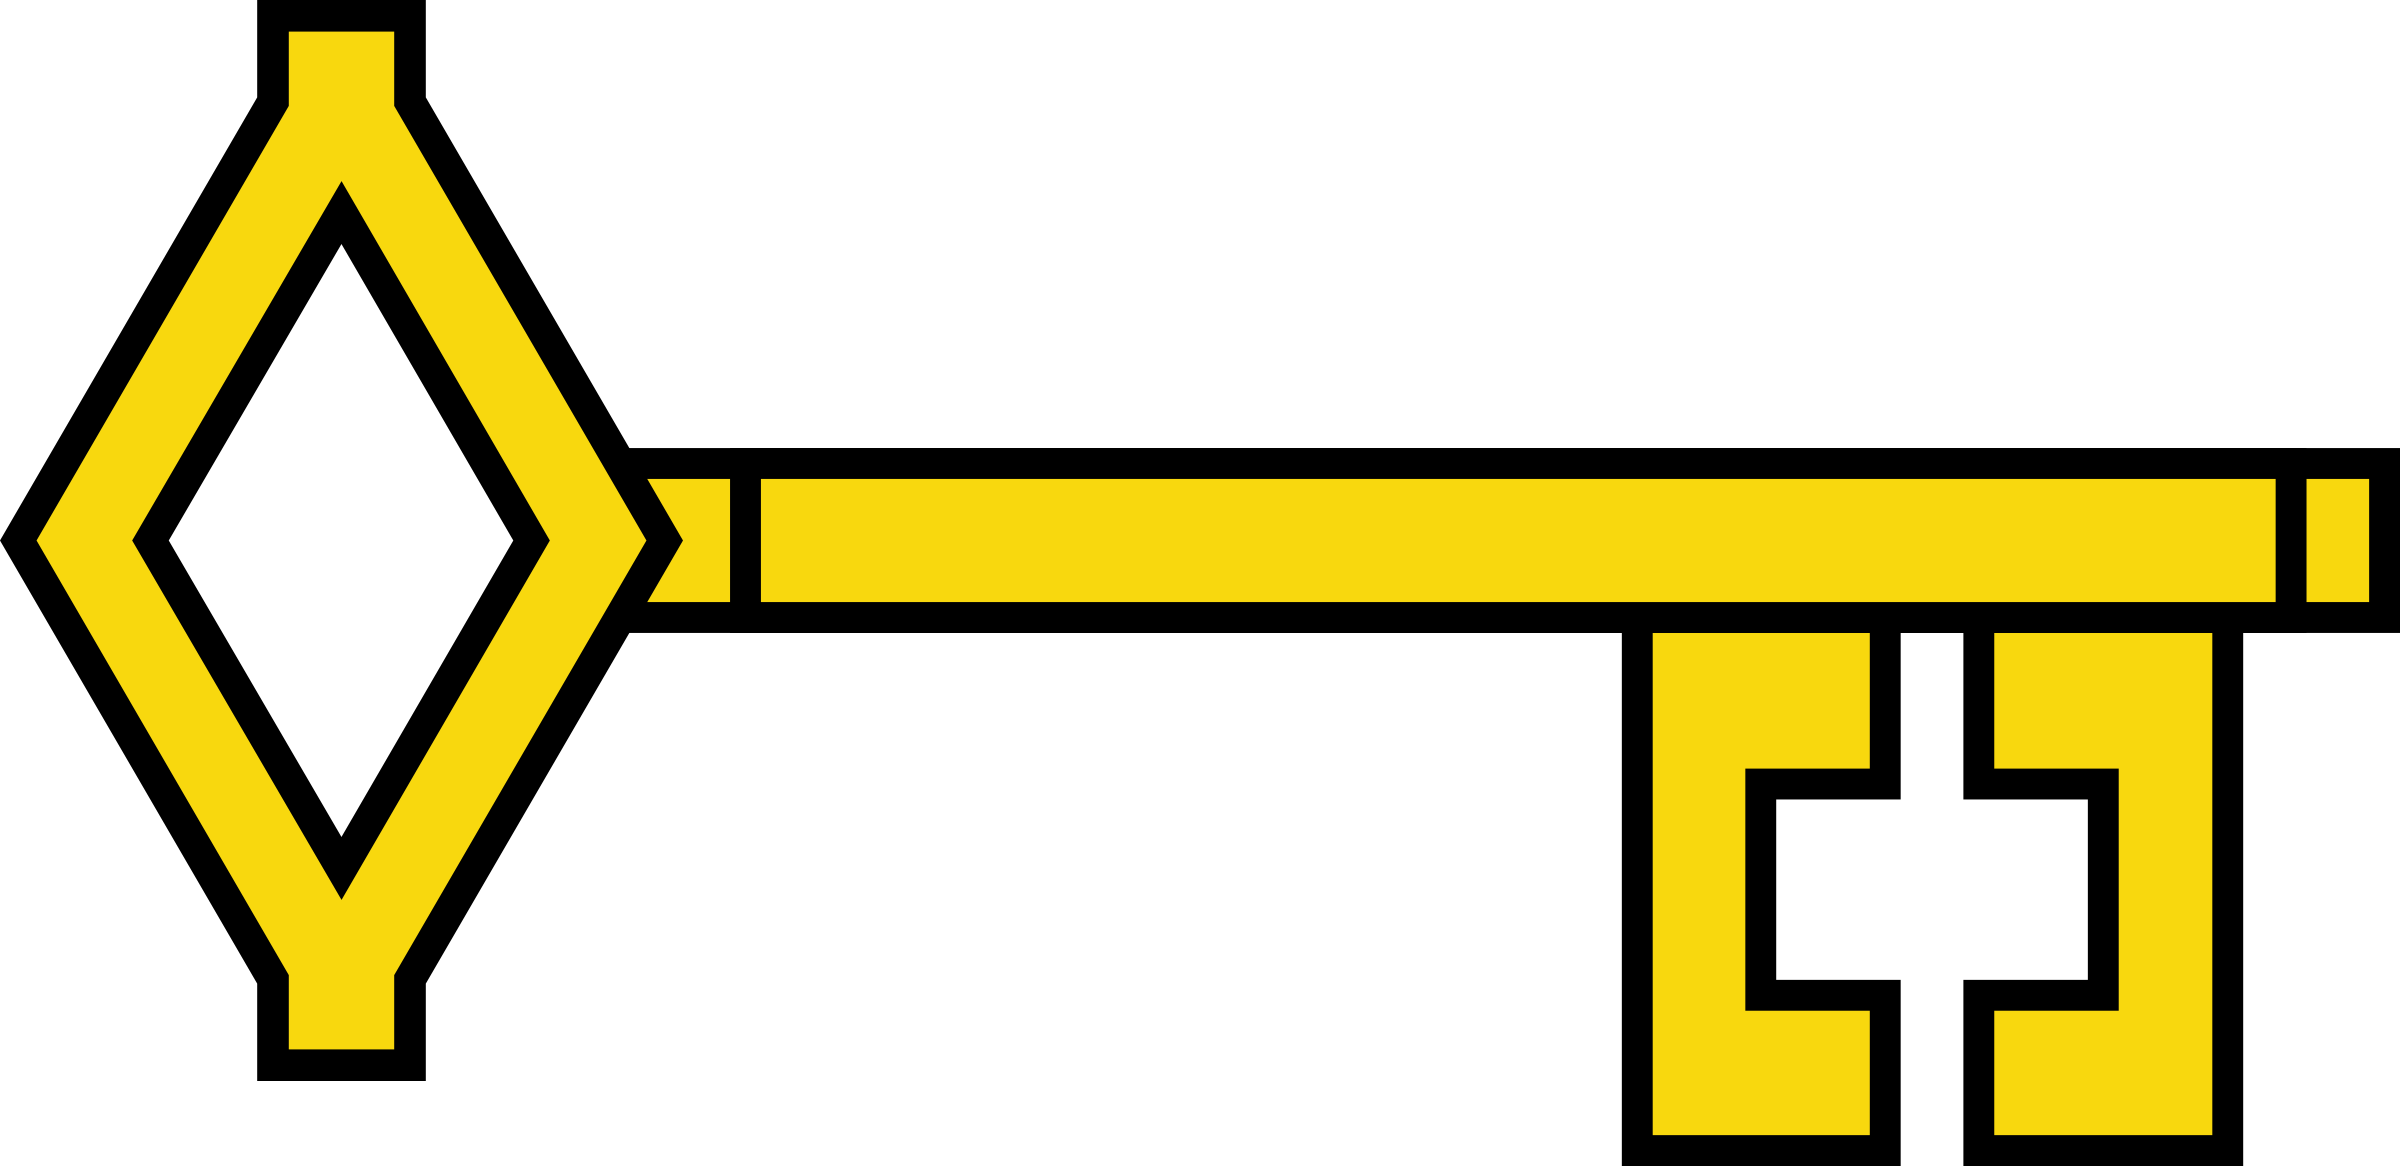 Key clipart yellow. Big image png